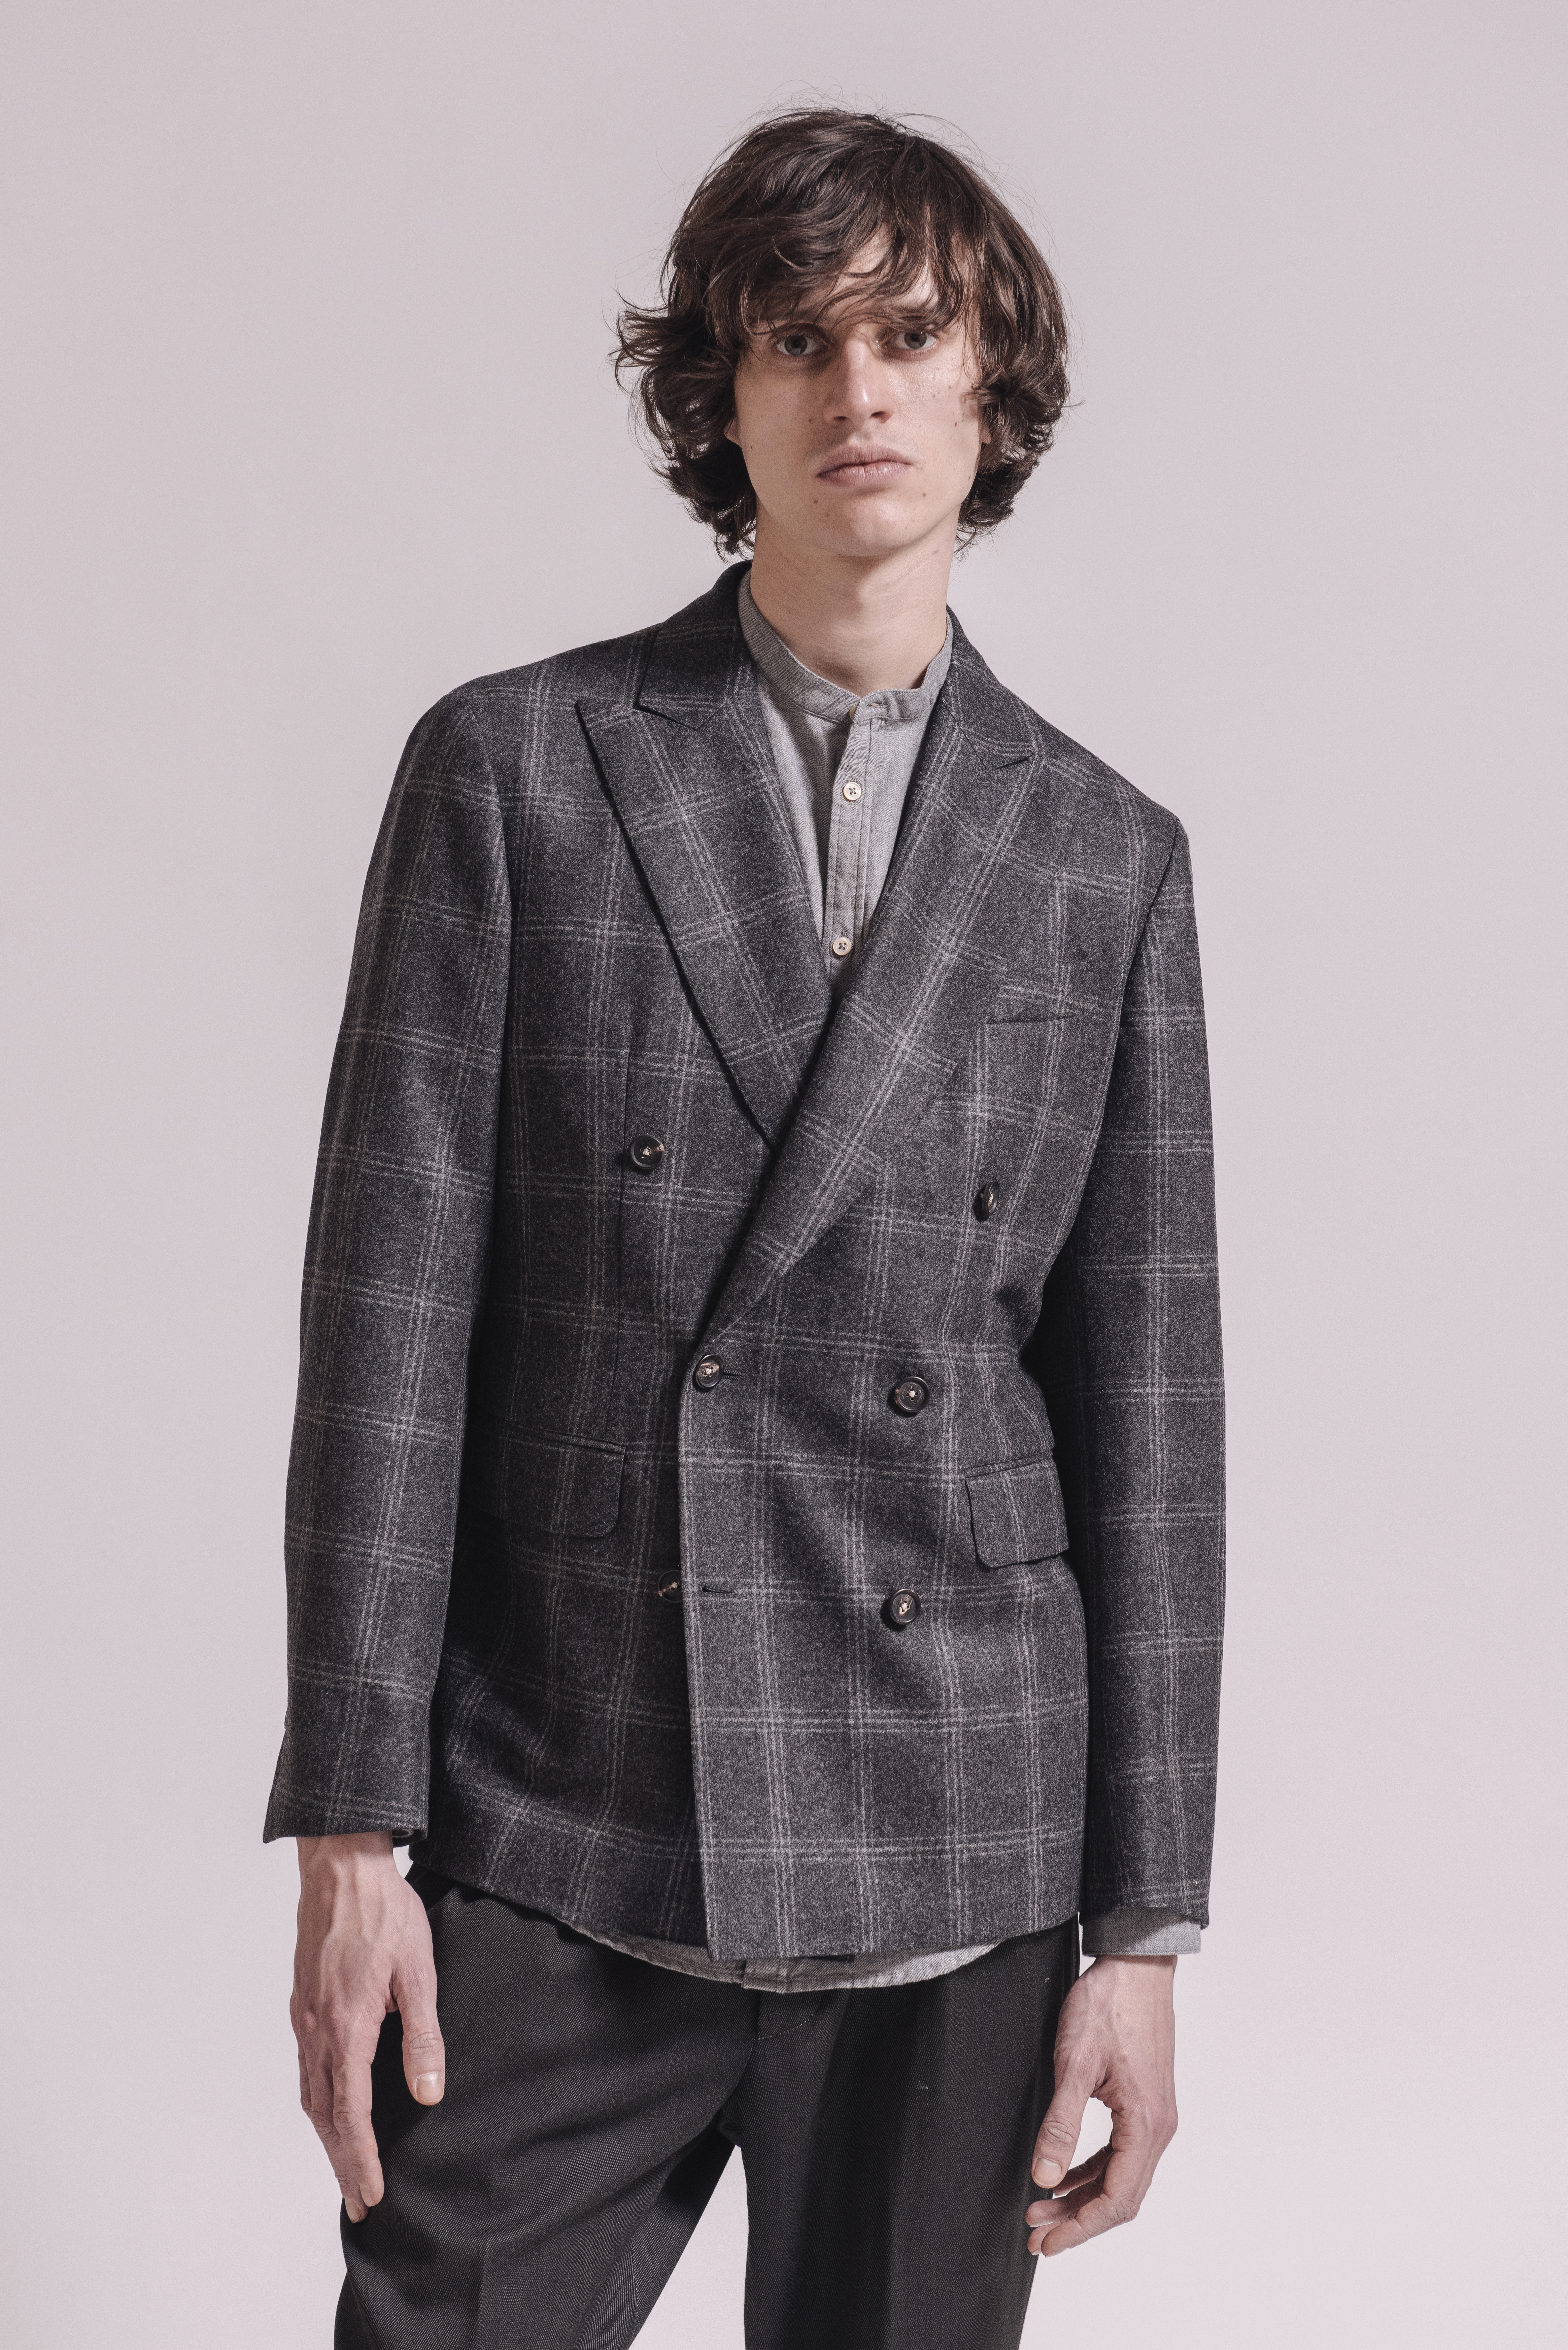 Travel Blazers (Massimo Alba deconstructed sartorial blazer) for Trending at Pitti Uomo, shot January 11, 2018.